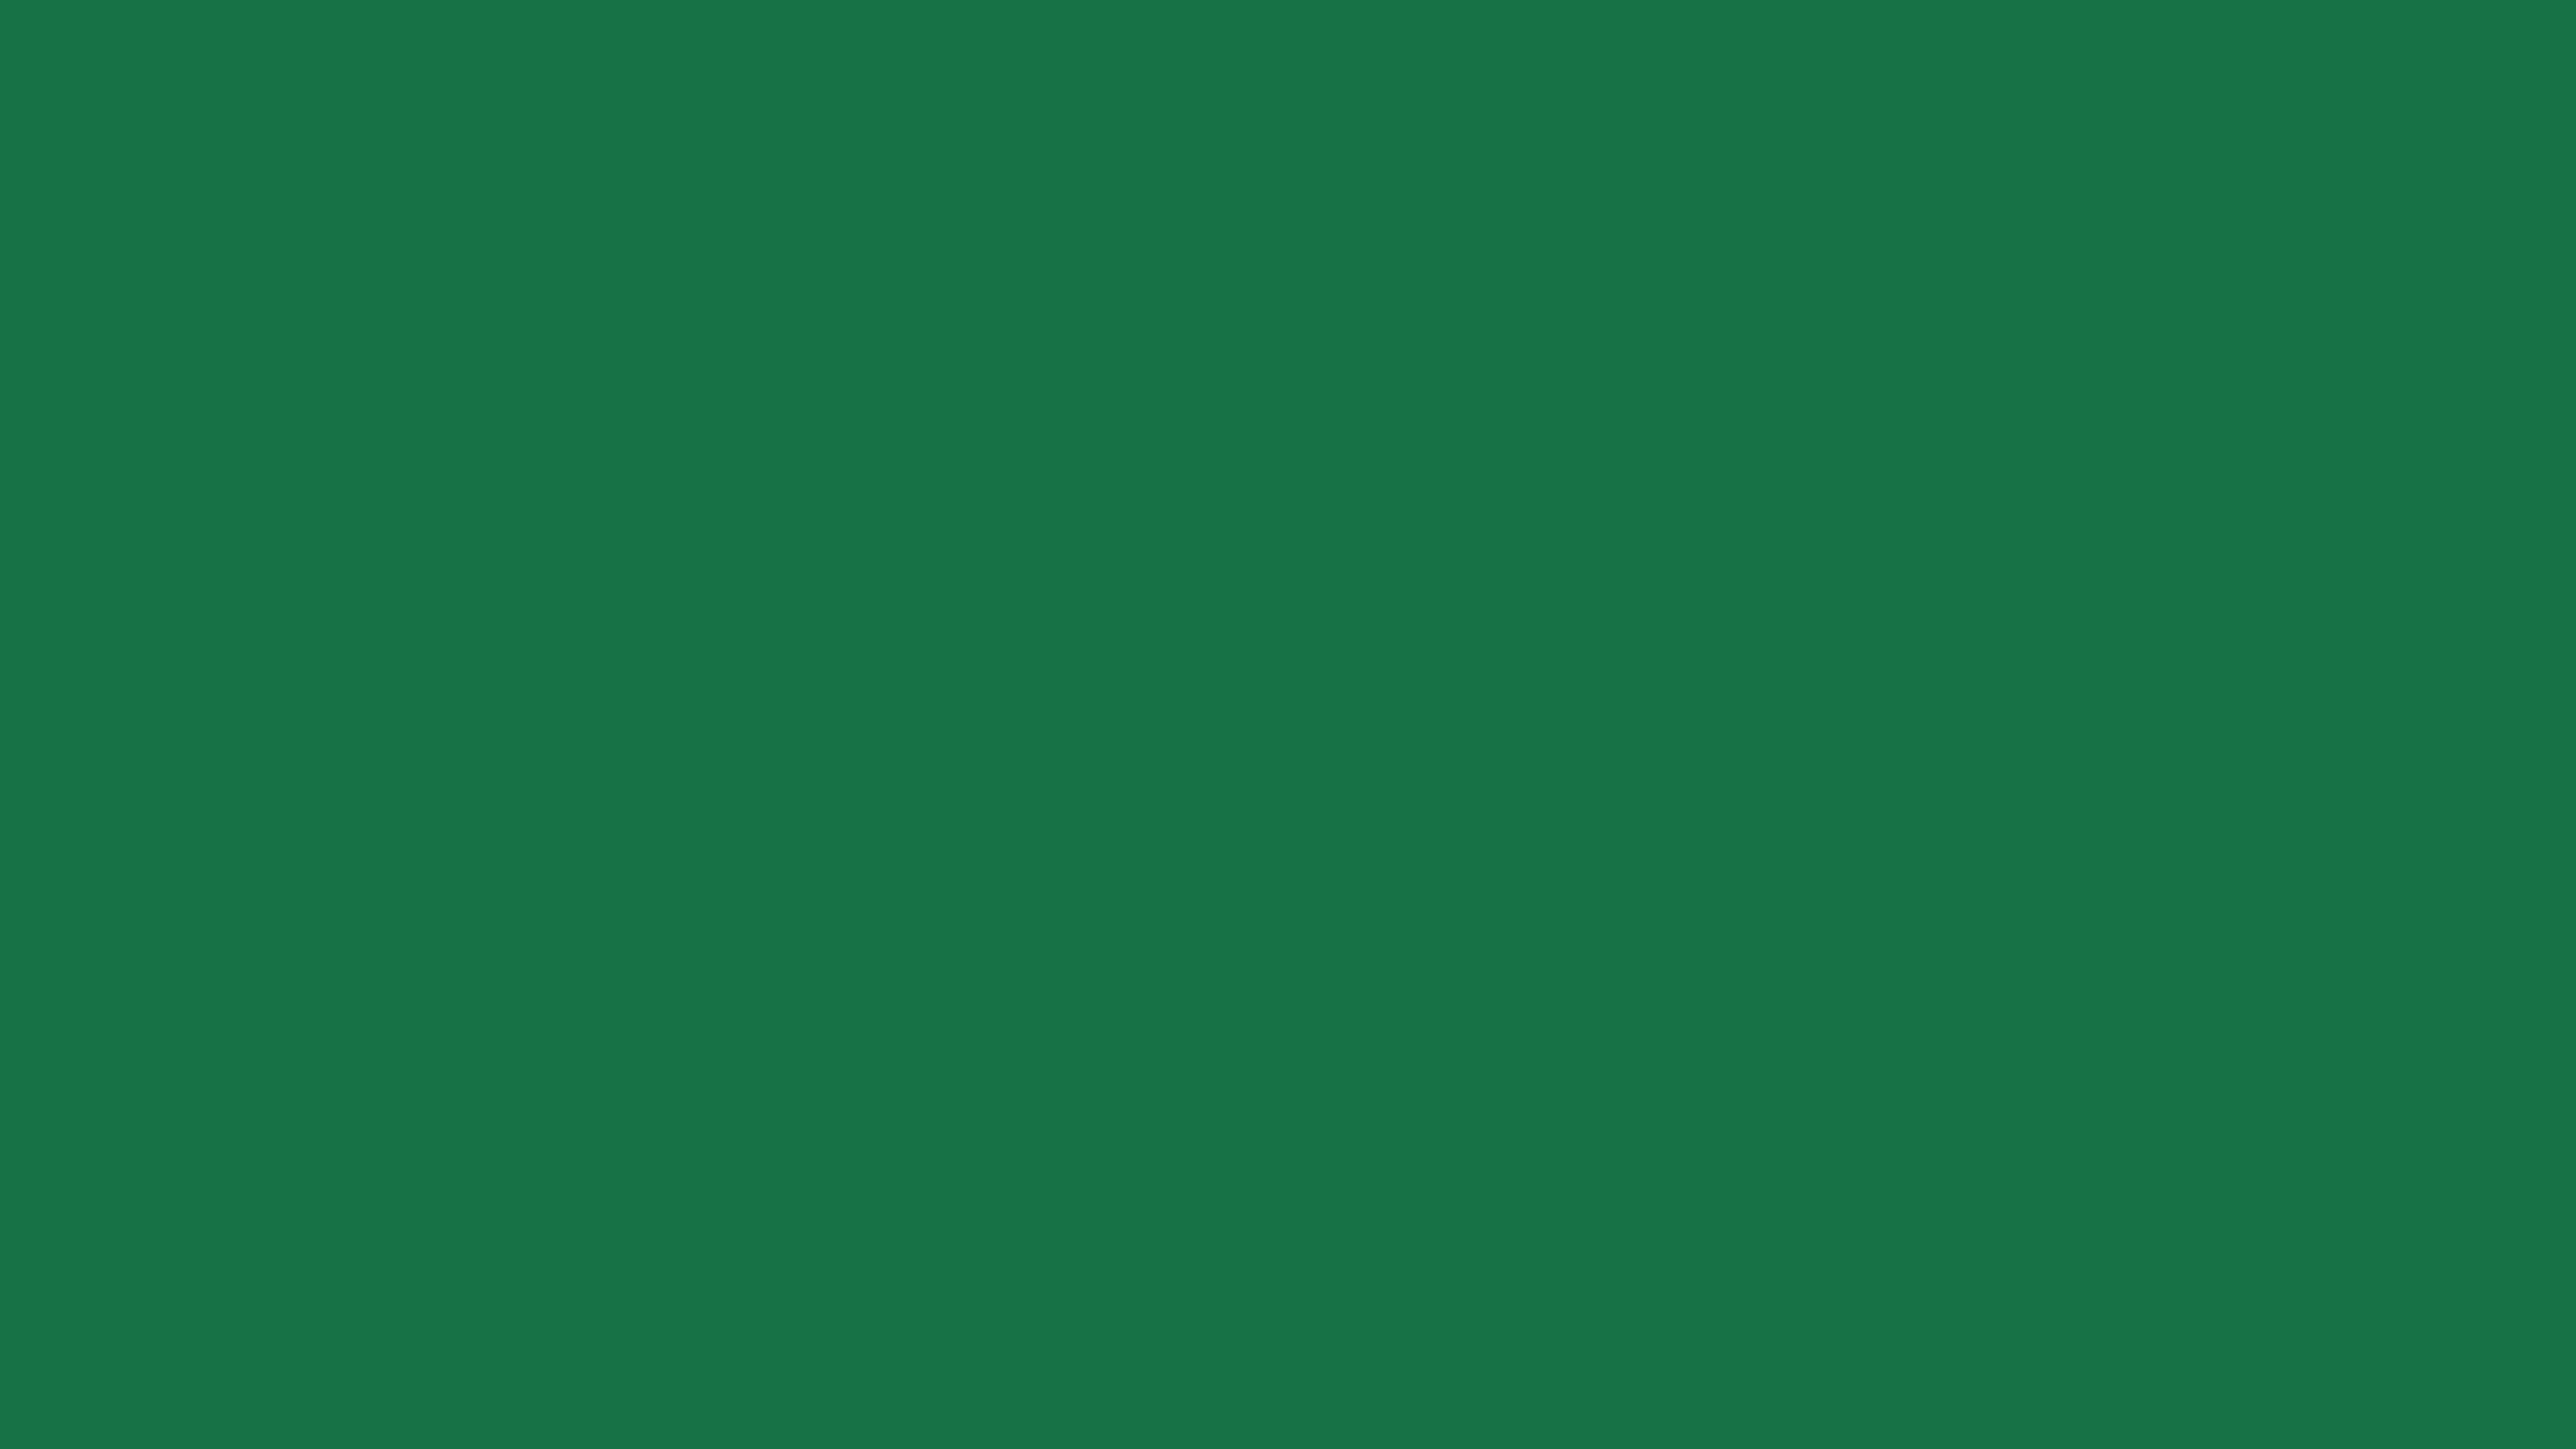 4096x2304 Dark Spring Green Solid Color Background